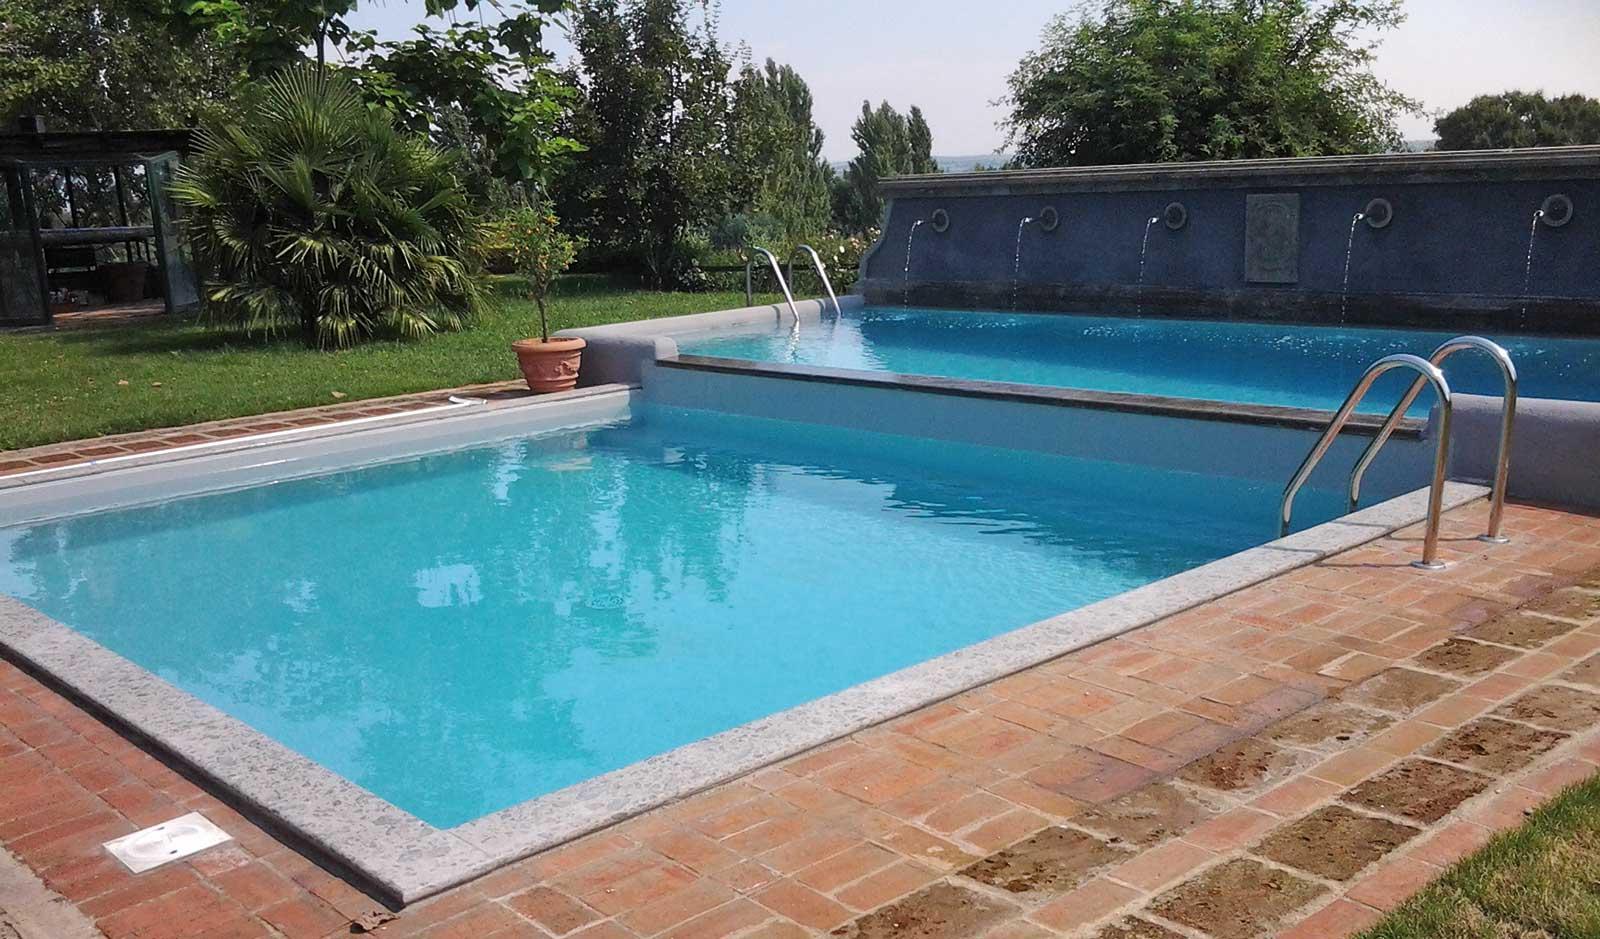 https://gajarda.com/wp-content/uploads/2019/11/piscine-ristrutturazioni-home01.jpg